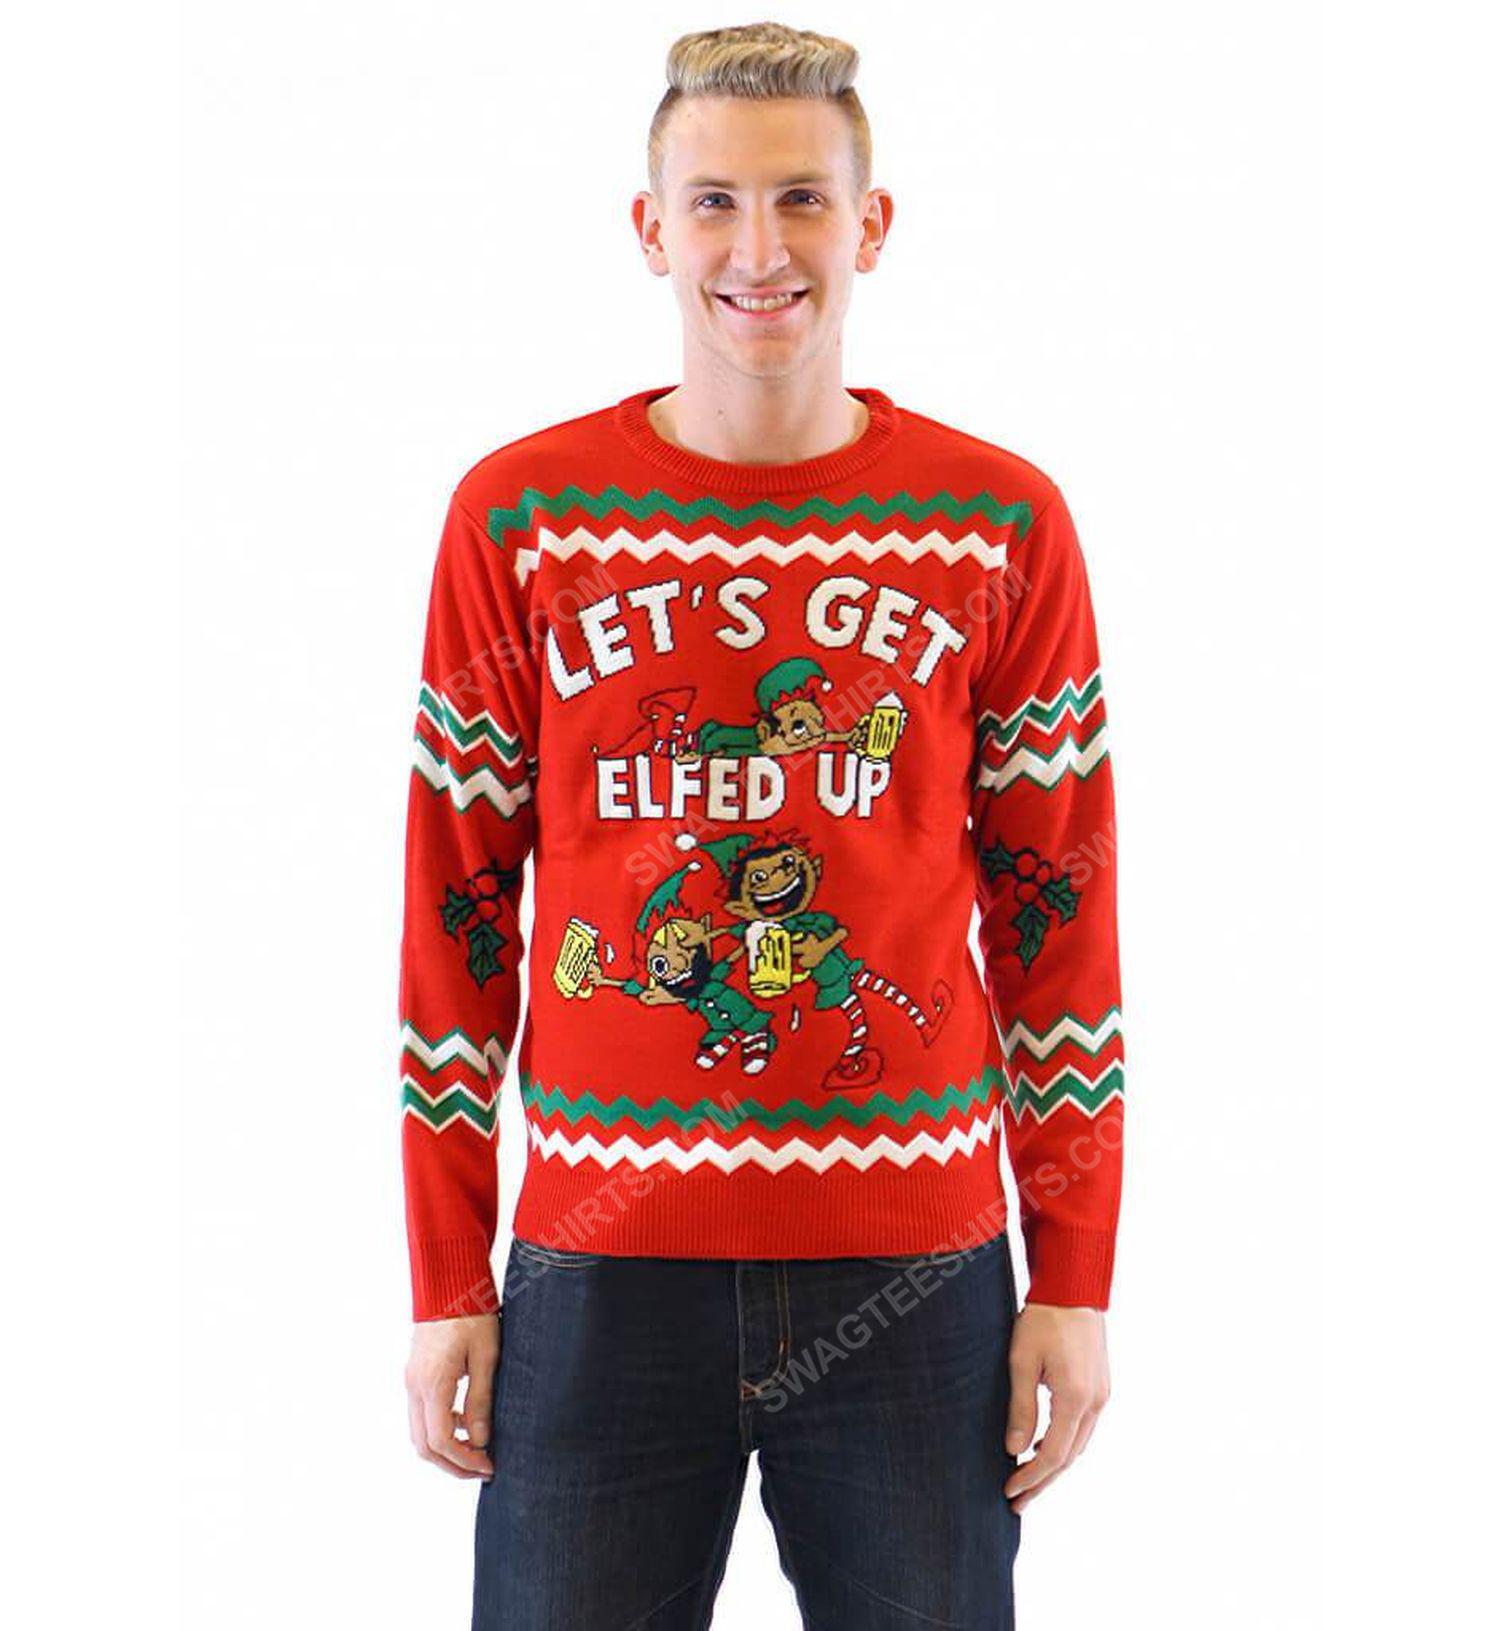 Let's get elfed up drunken elves full print ugly christmas sweater 2